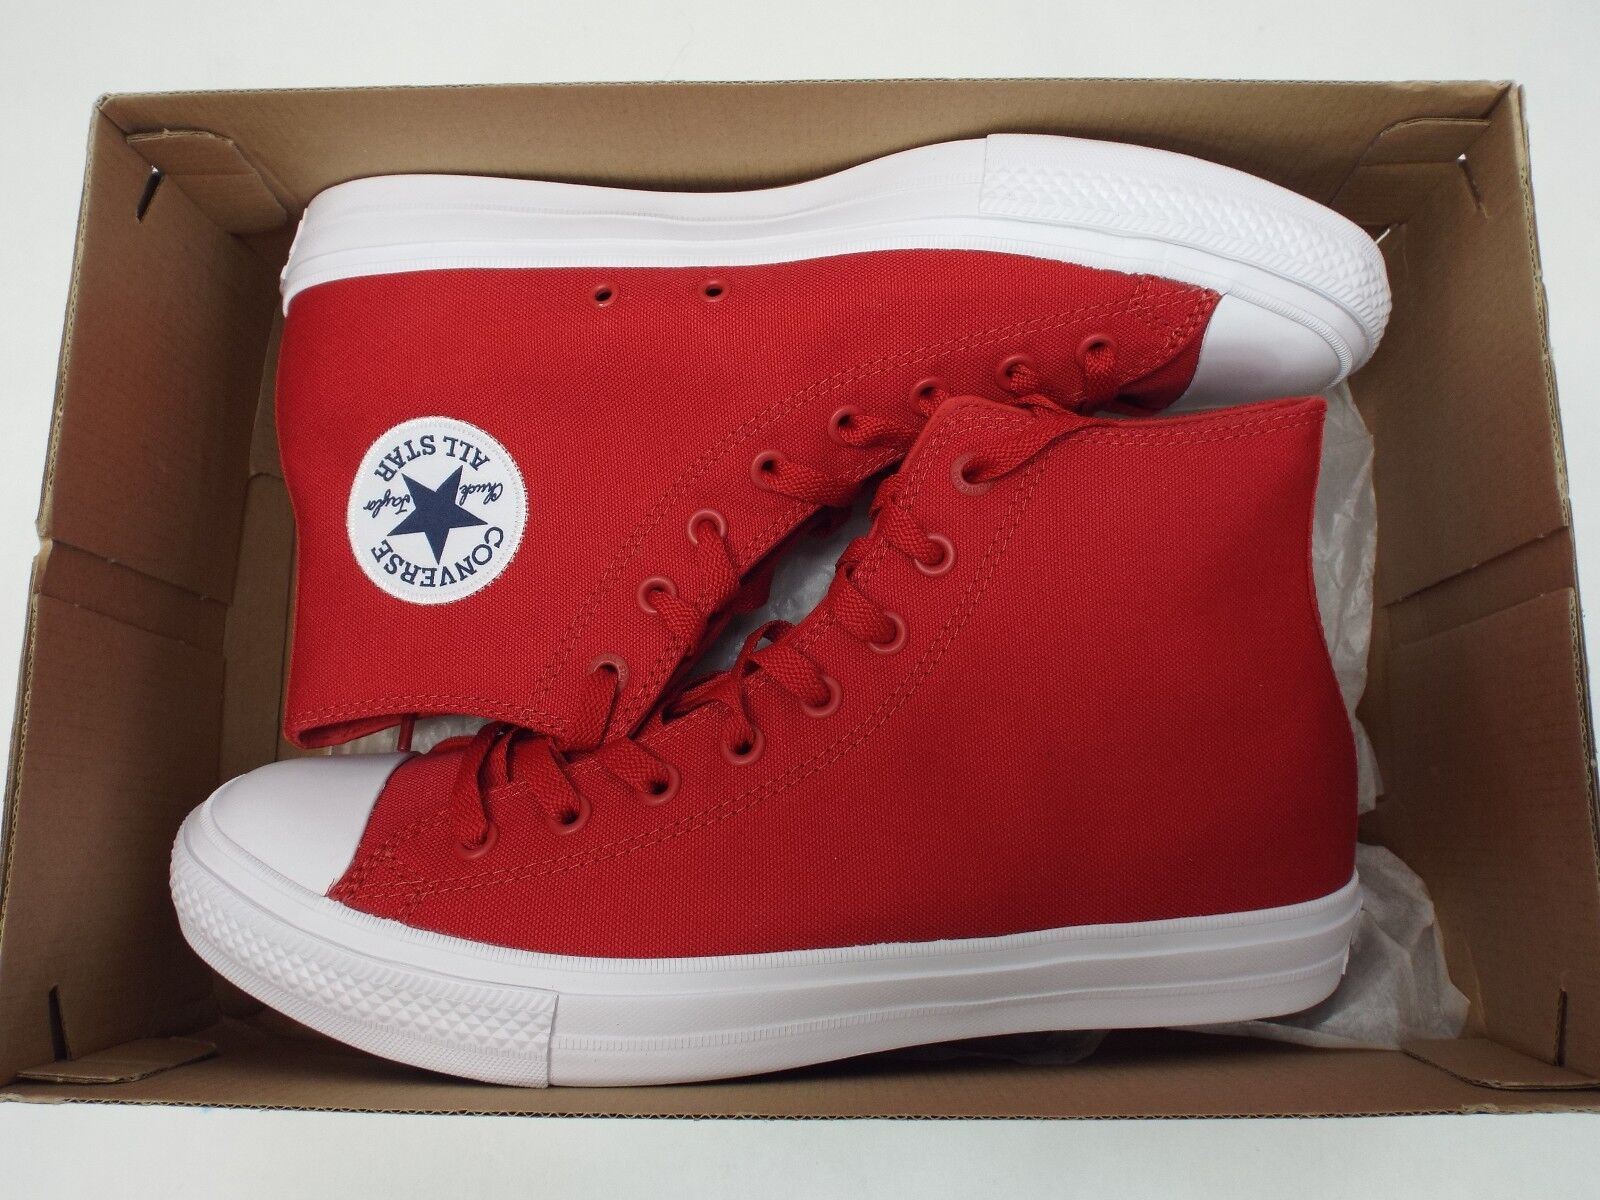 8ada747e425 ... New Mens 12 Converse Converse Converse CT 2 HI Salsa Red Canvas  Basketball Shoes 150145C  75